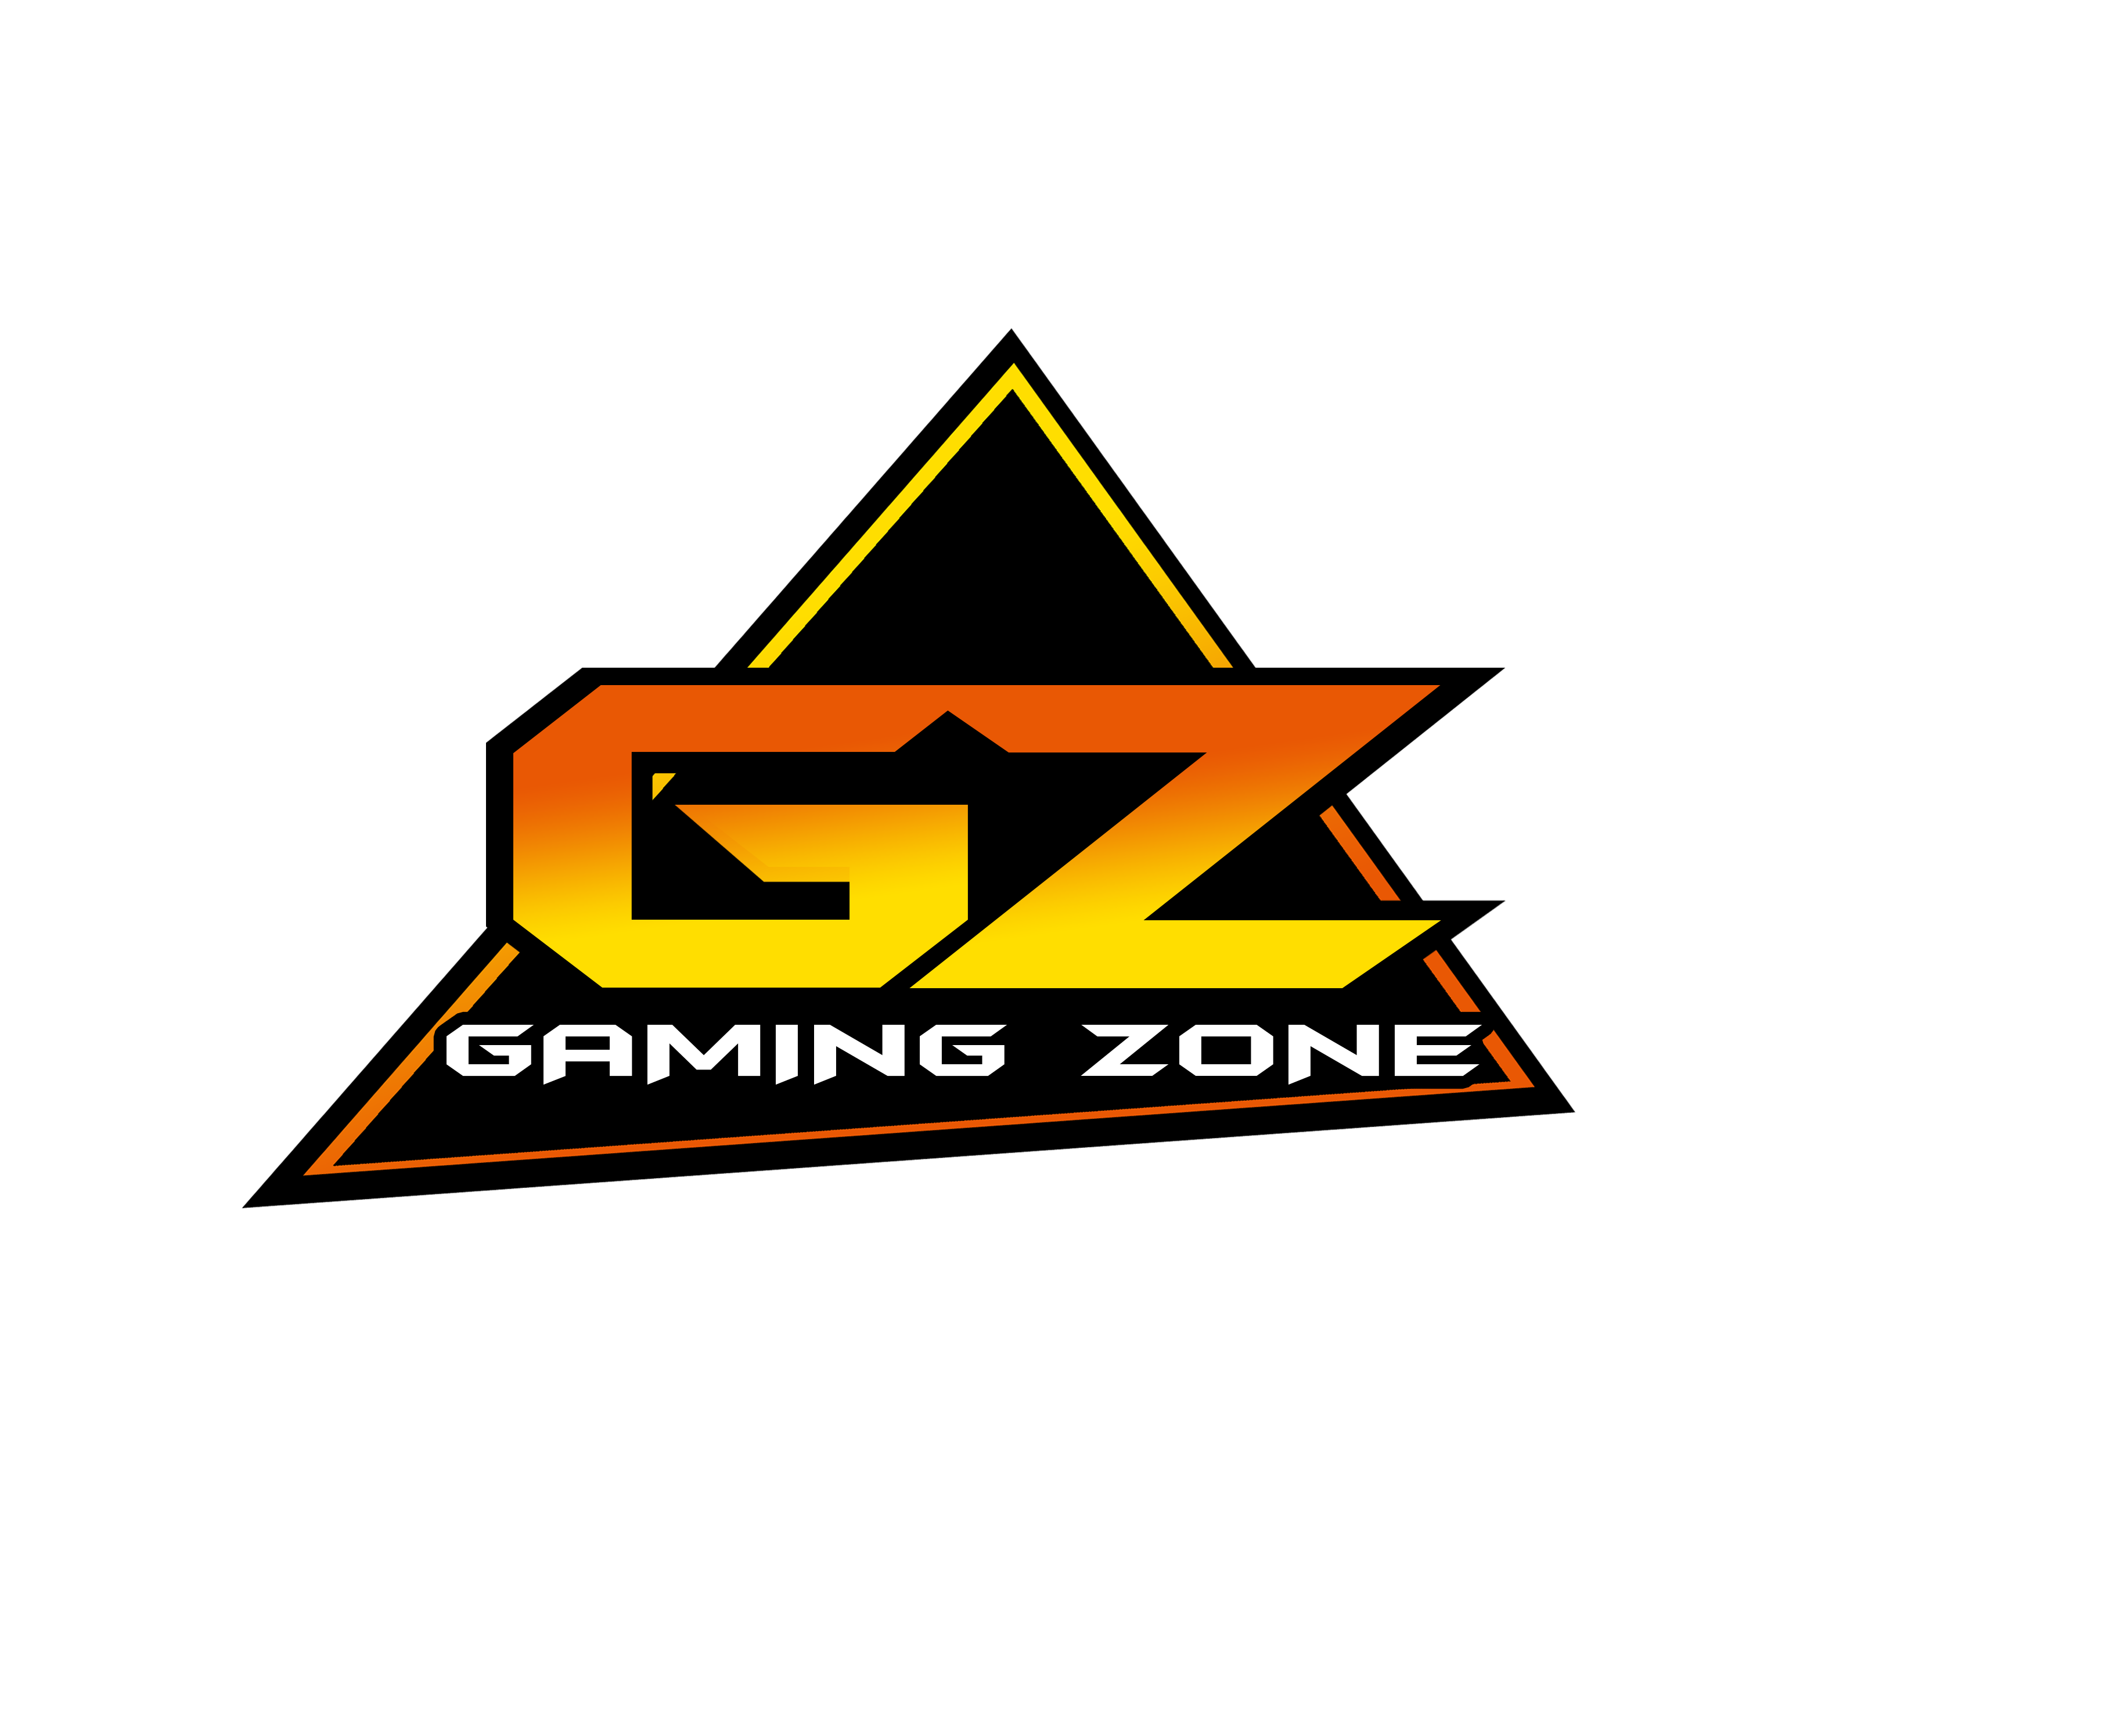 game zone logo png